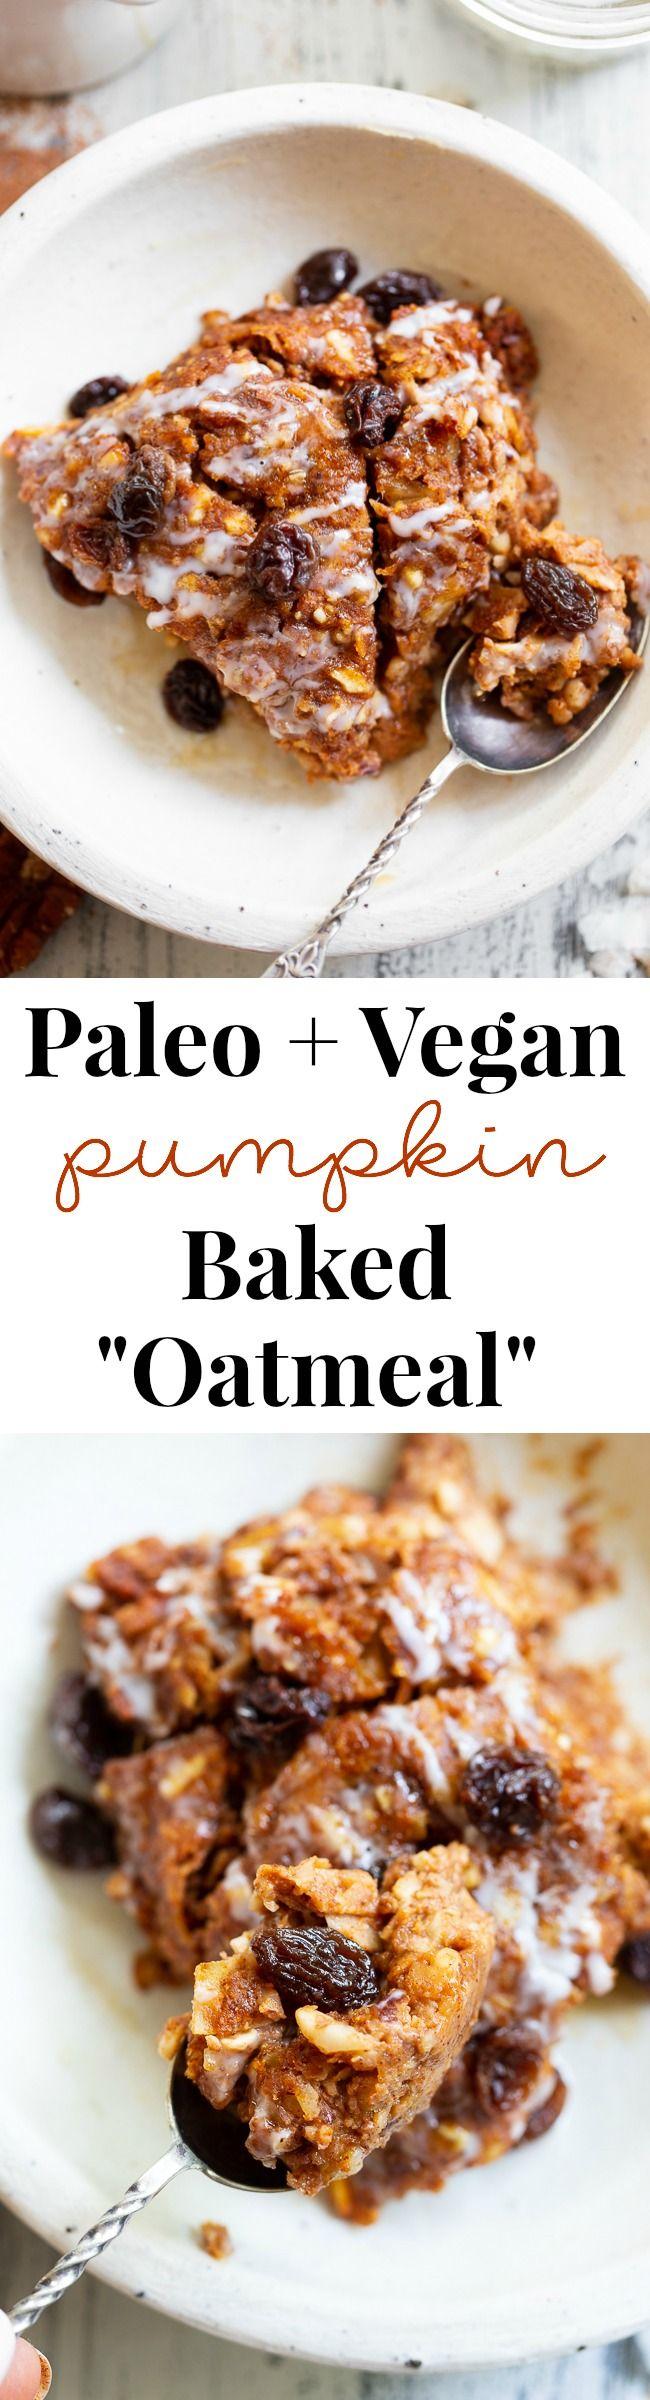 Pumpkin Oatmeal Bake Justeatrealfood Paleorunningmomma Pumpkin Oatmeal Paleo Baking Paleo Pumpkin Recipes